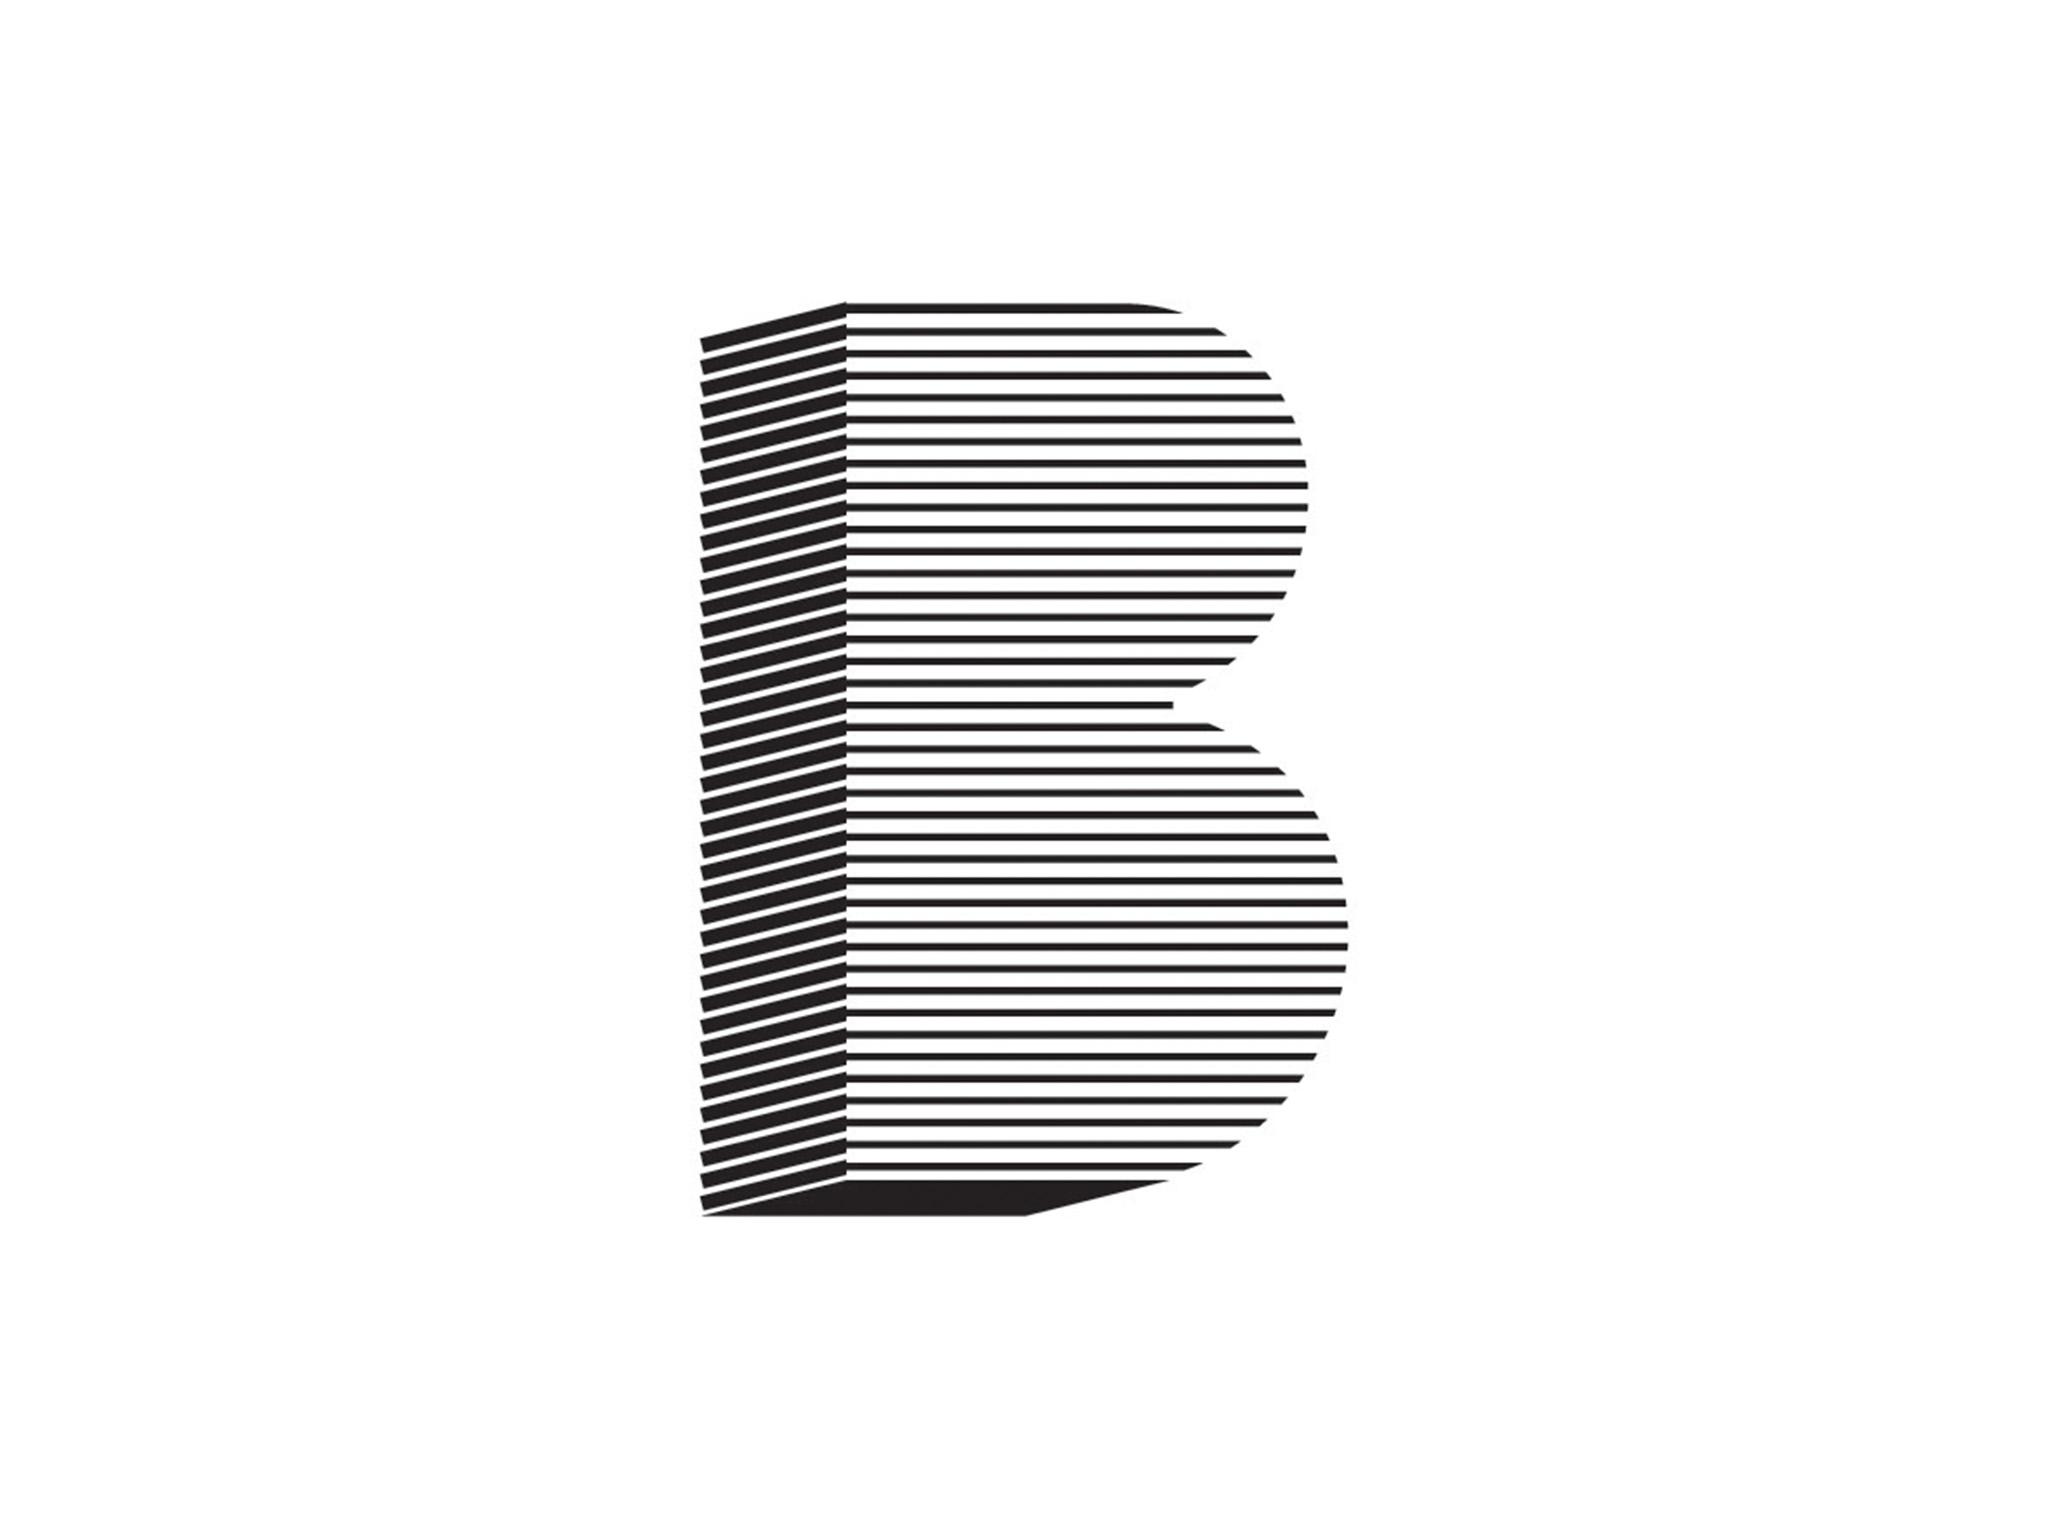 apex_letters_horizontal_large_0010_2_final_alphabet coasters-02.jpg